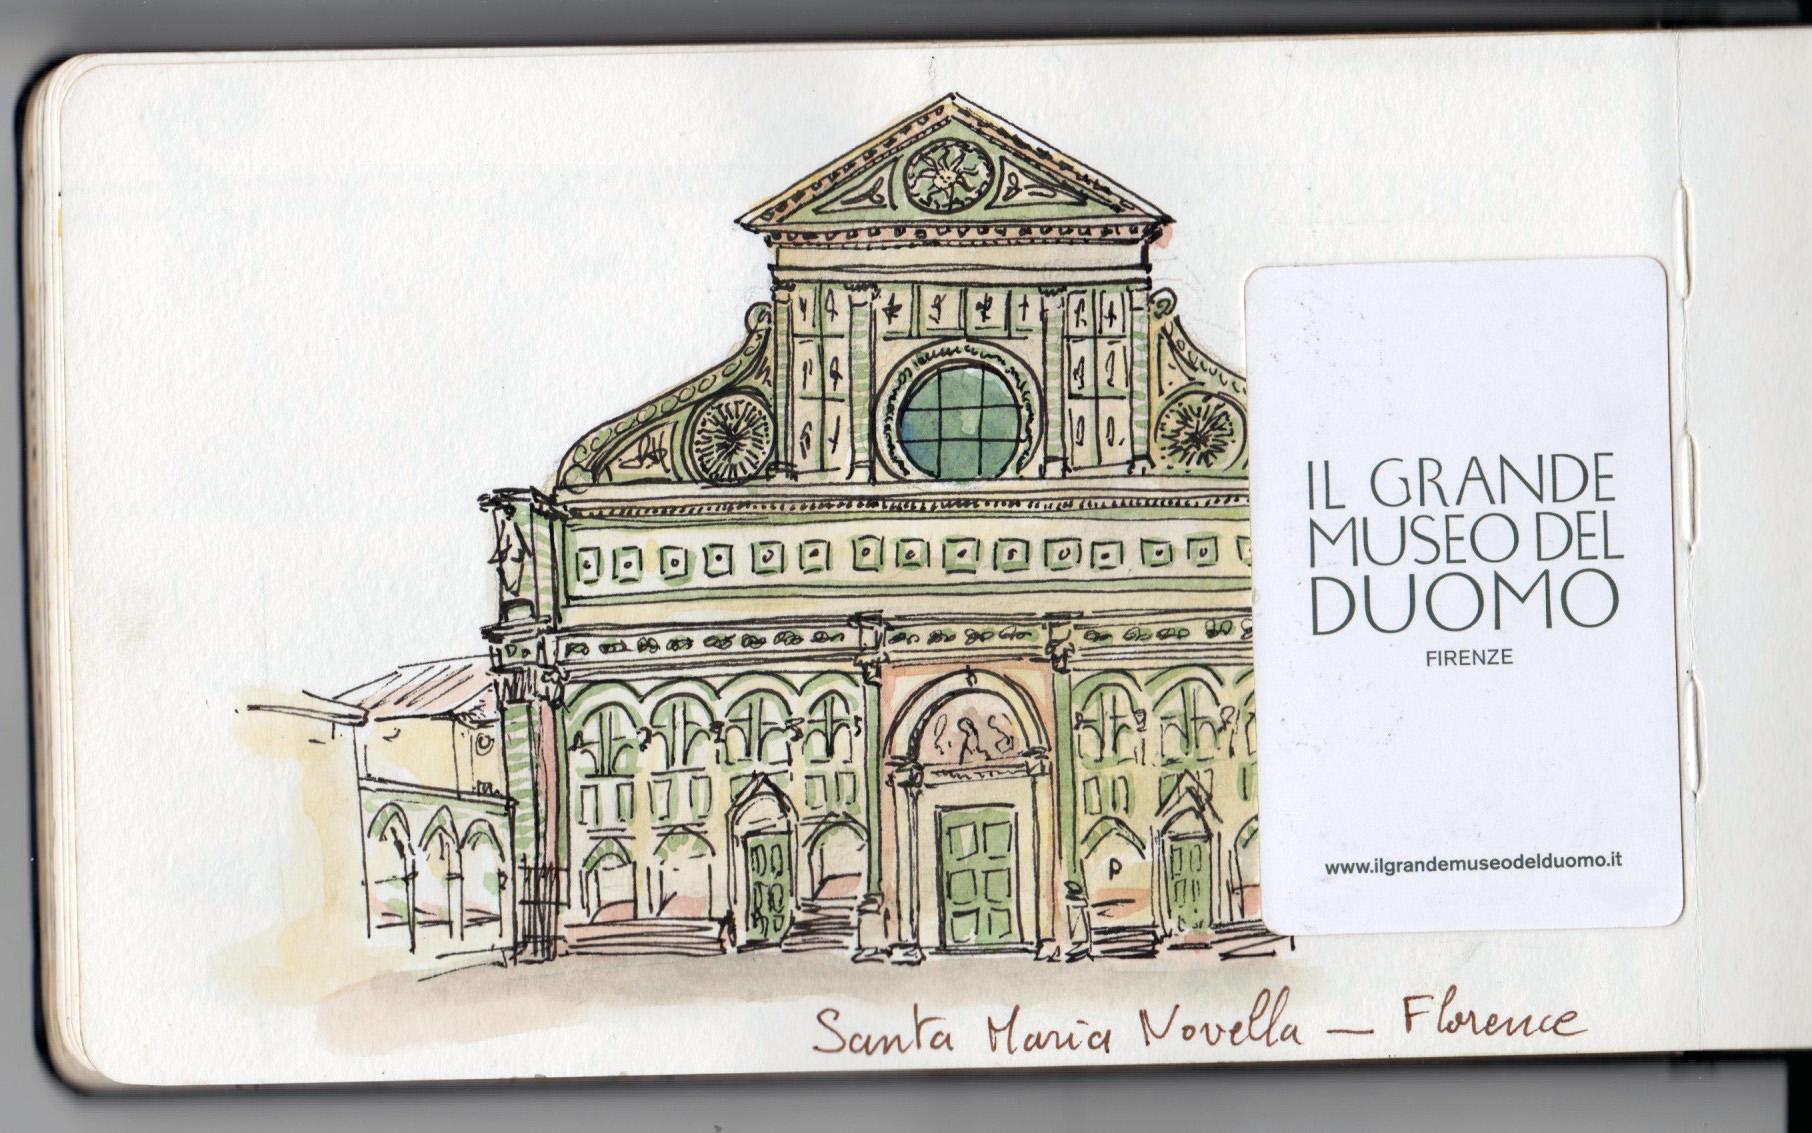 Santa Maria Novella — Florence